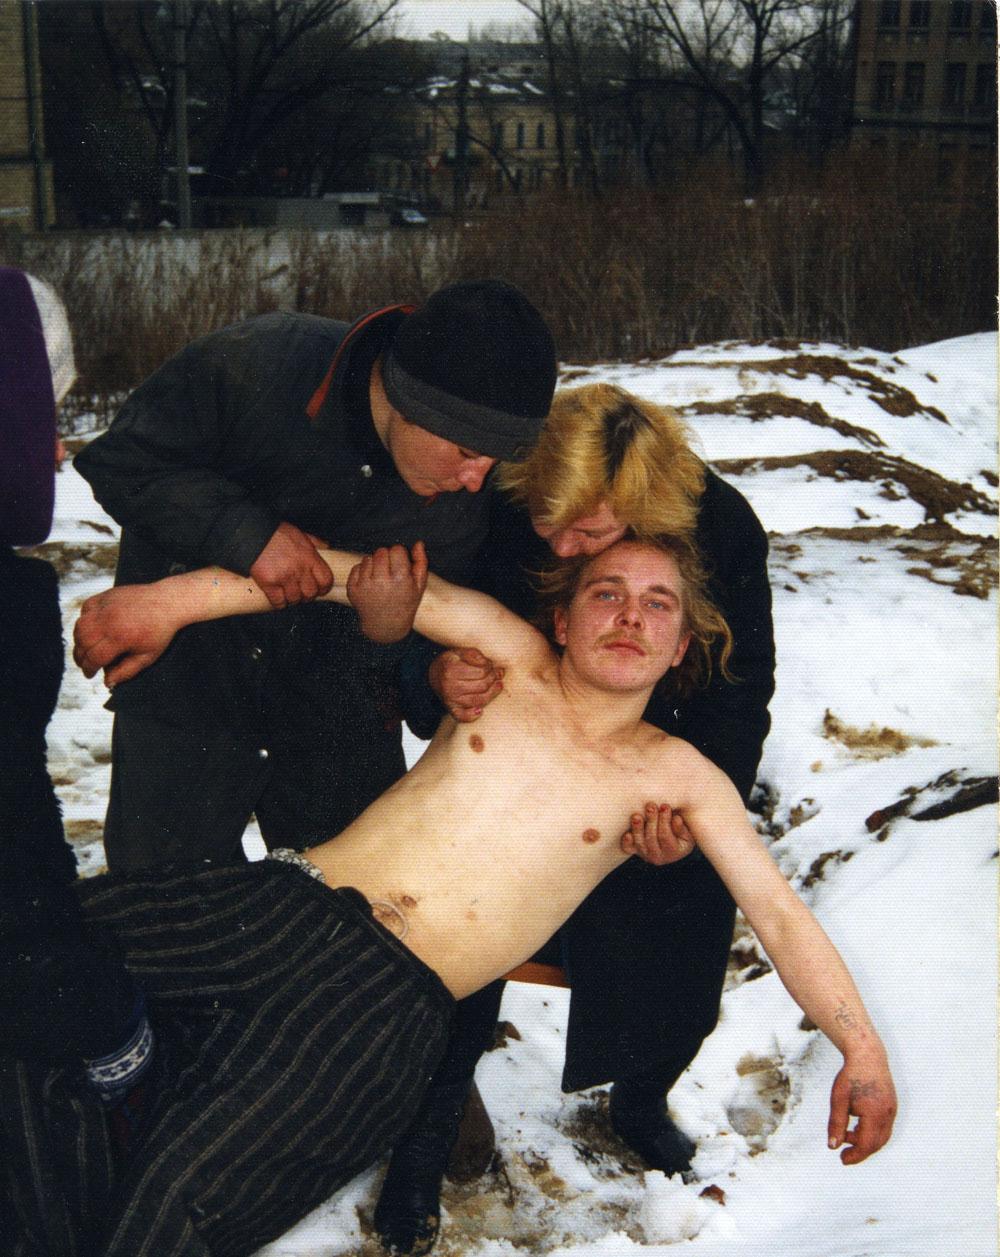 "Boris Mikhailov: aus der Reihe ""Case History"" (Krankengeschichte), 1997/1998, Farbfotografien © Boris Mikhailov, VG Bild-Kunst, Bonn 2015; courtesy Galerie Barbara Weiss, Berlin"